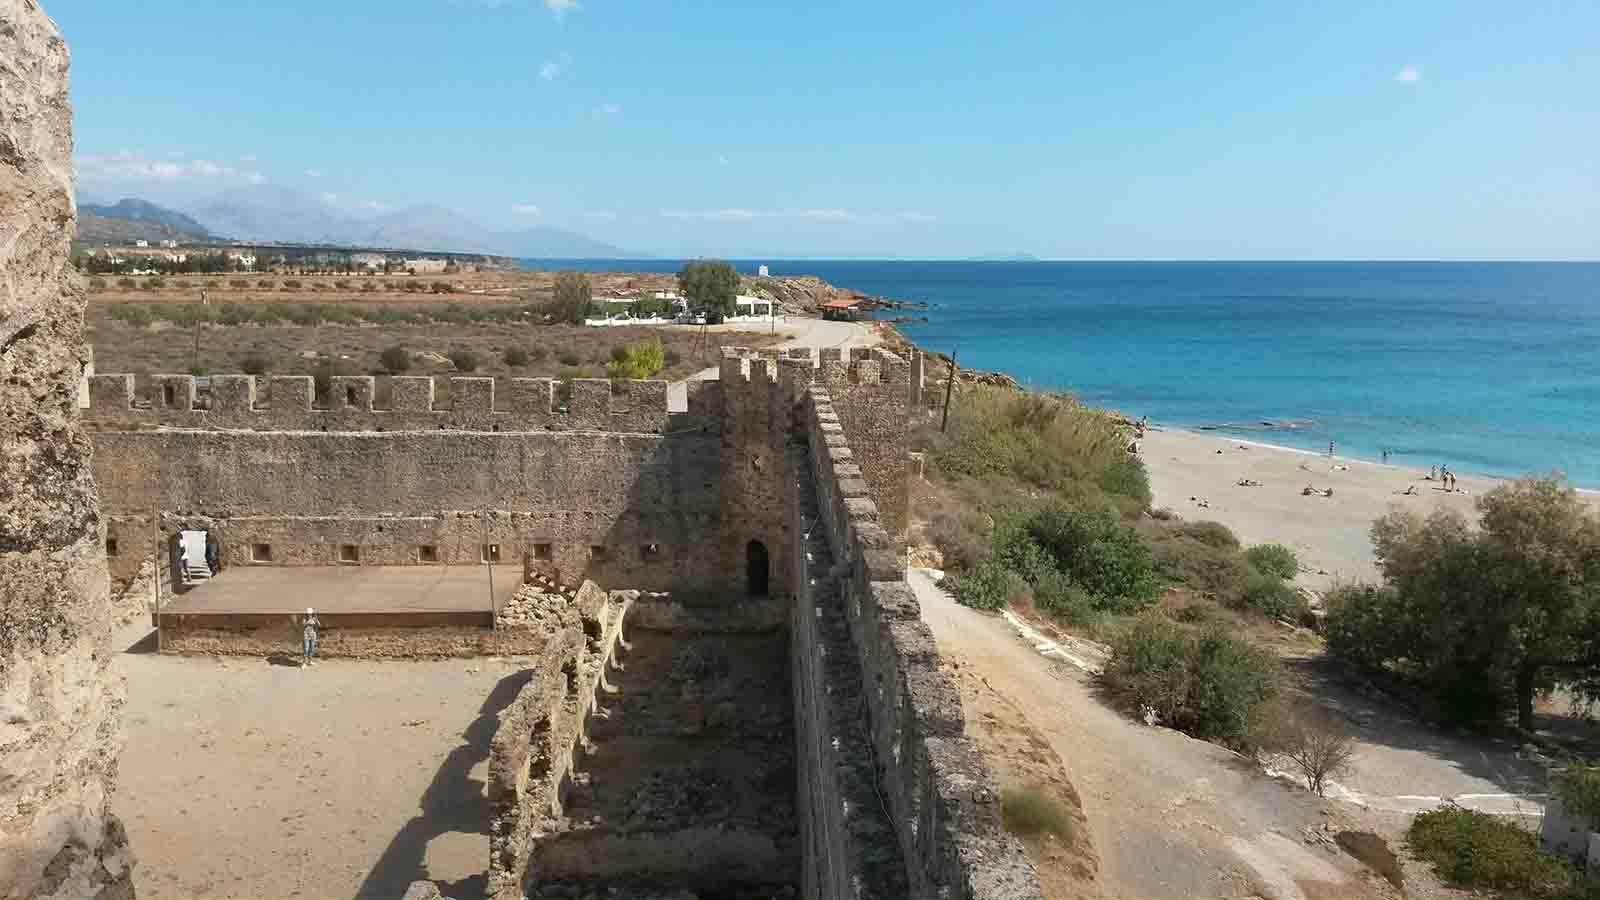 Frangokastello Crete